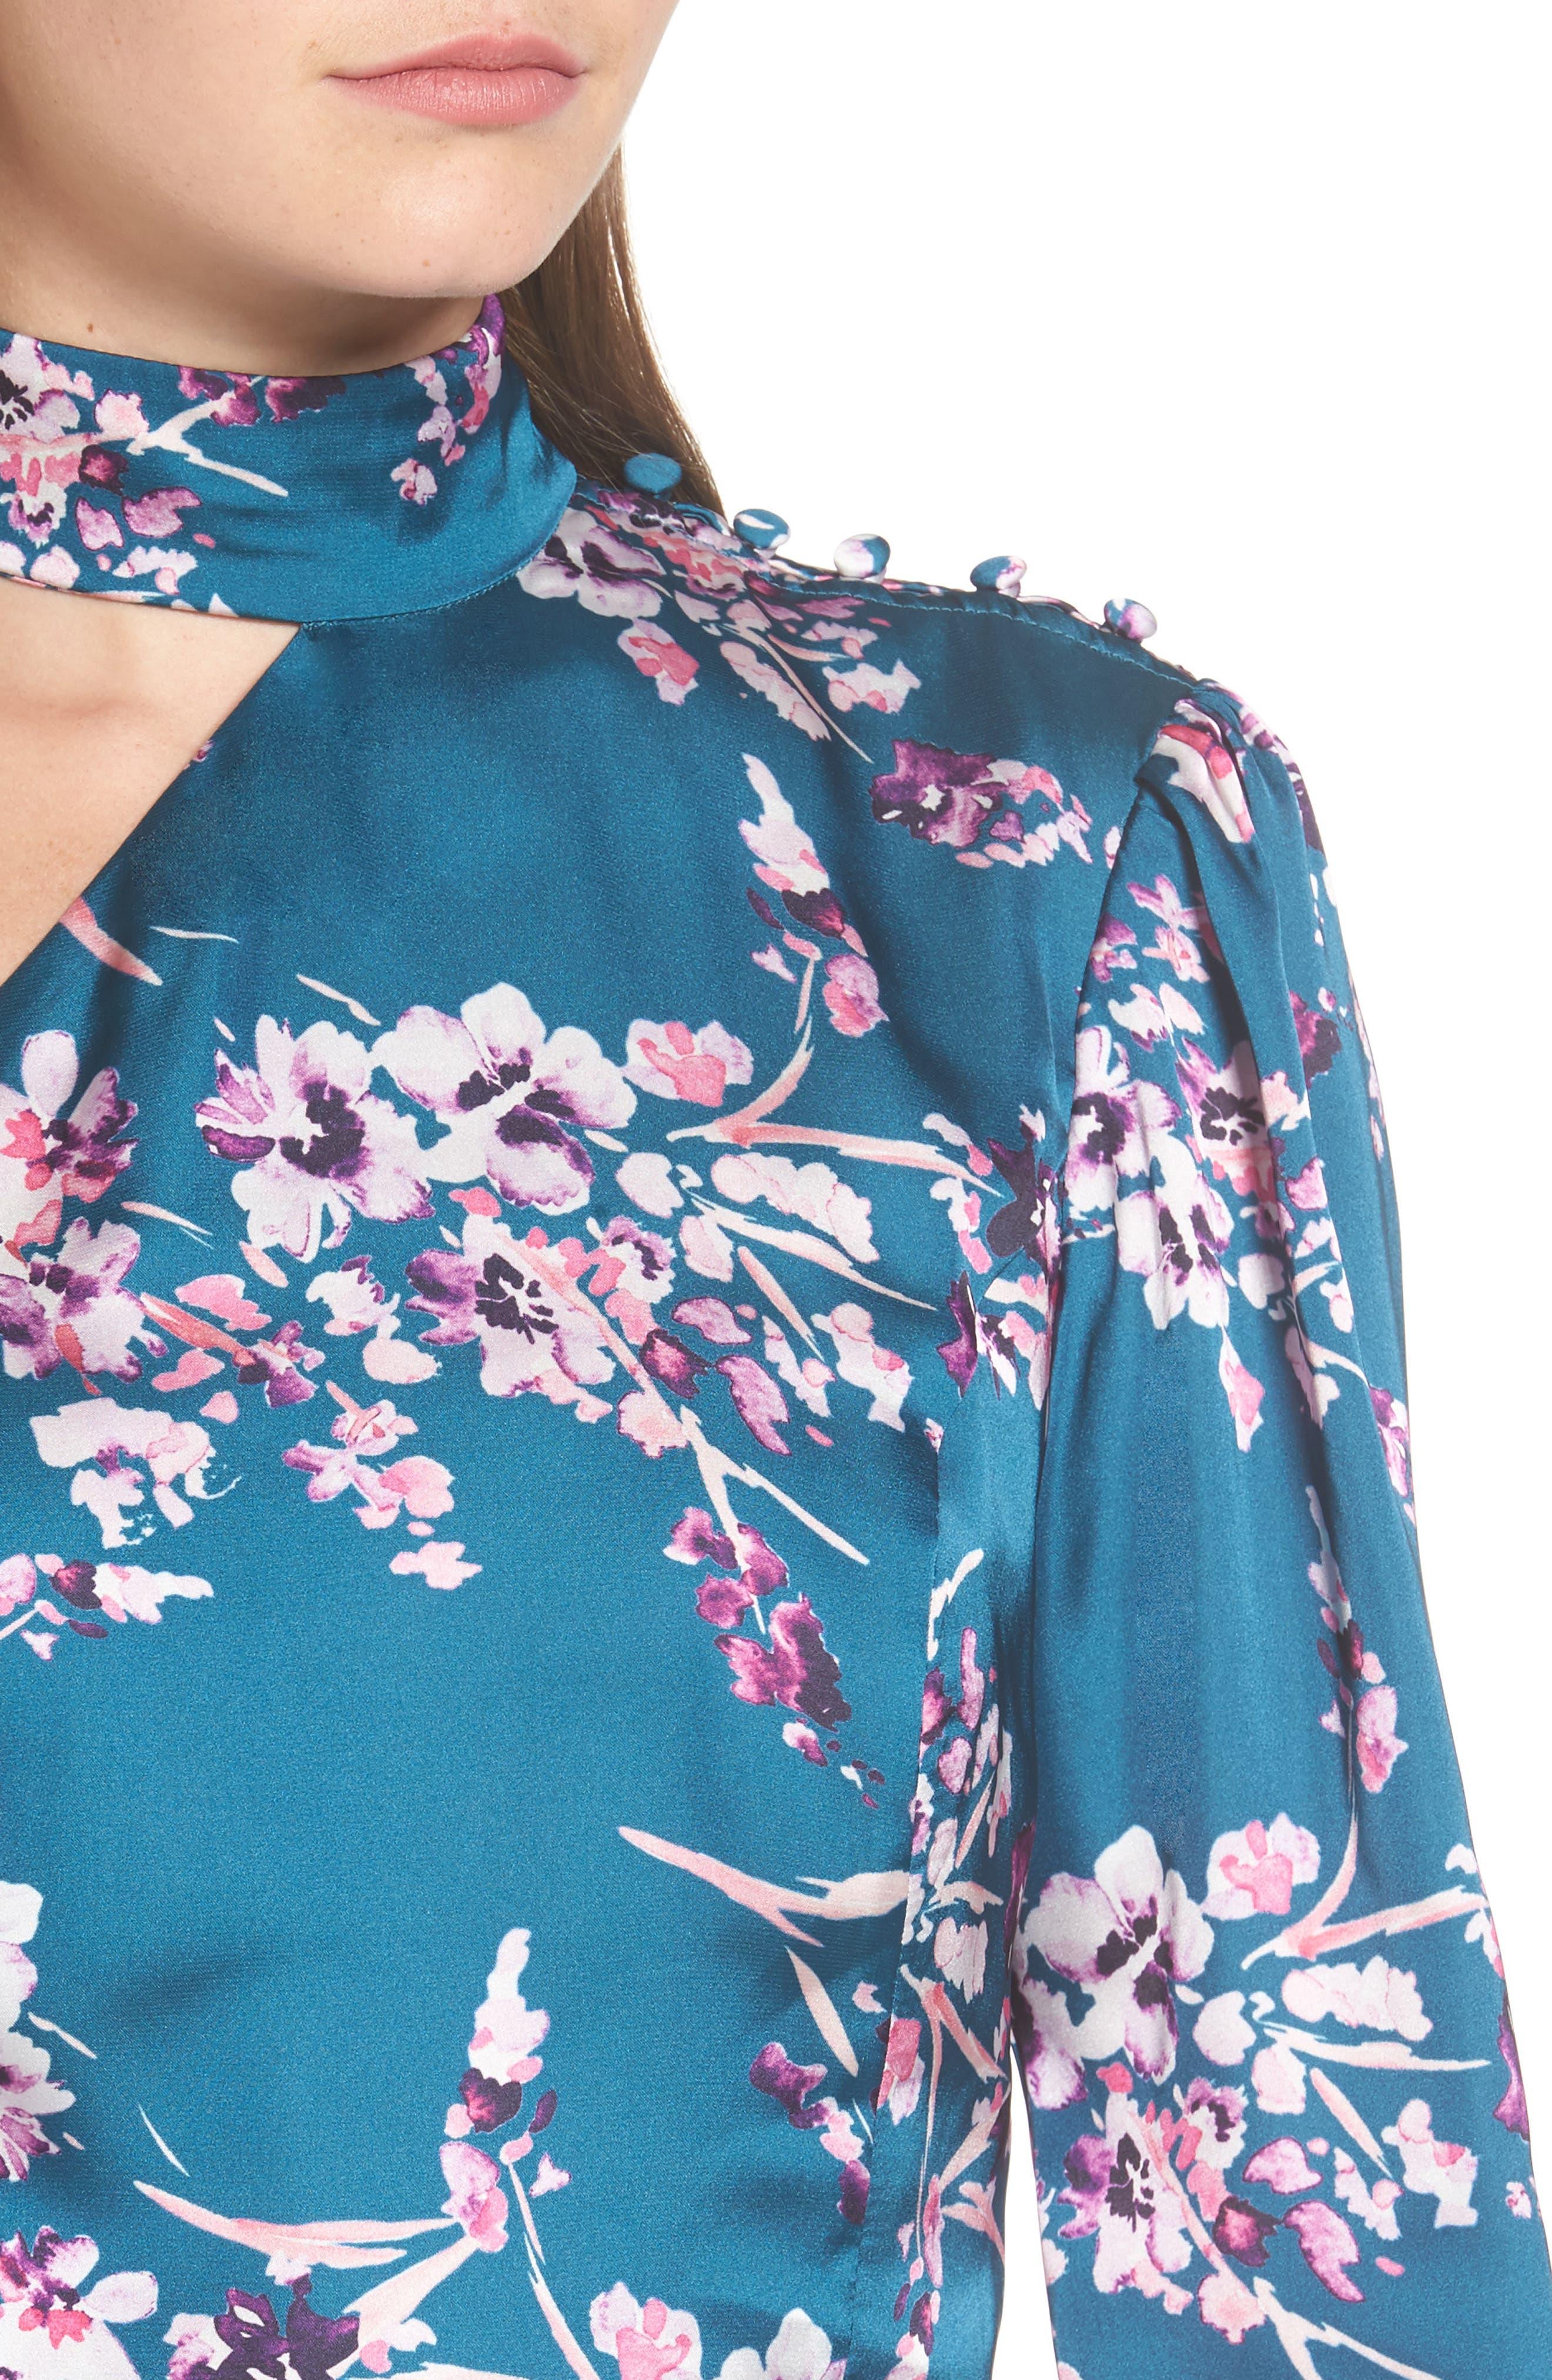 Clover Cold Shoulder Sheath Dress,                             Alternate thumbnail 4, color,                             Moroccan Blossom